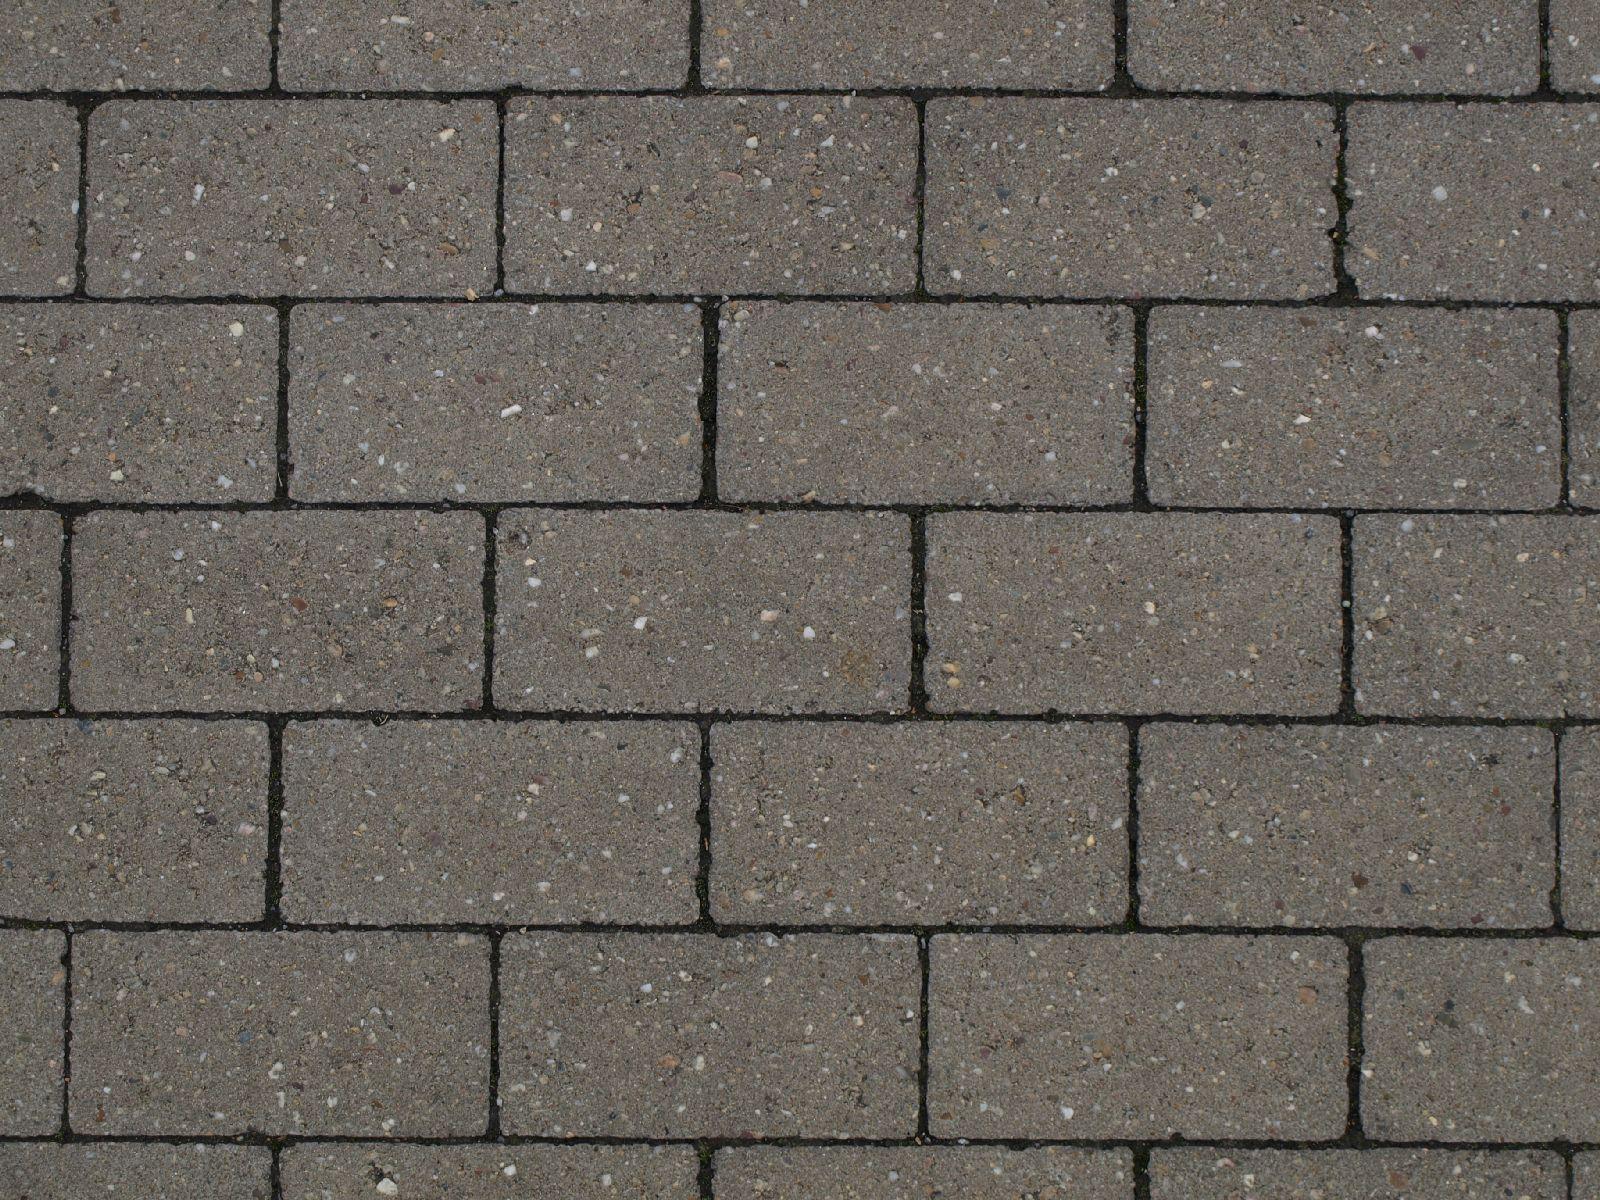 Boden-Gehweg-Strasse-Buergersteig-Textur_A_PA045738